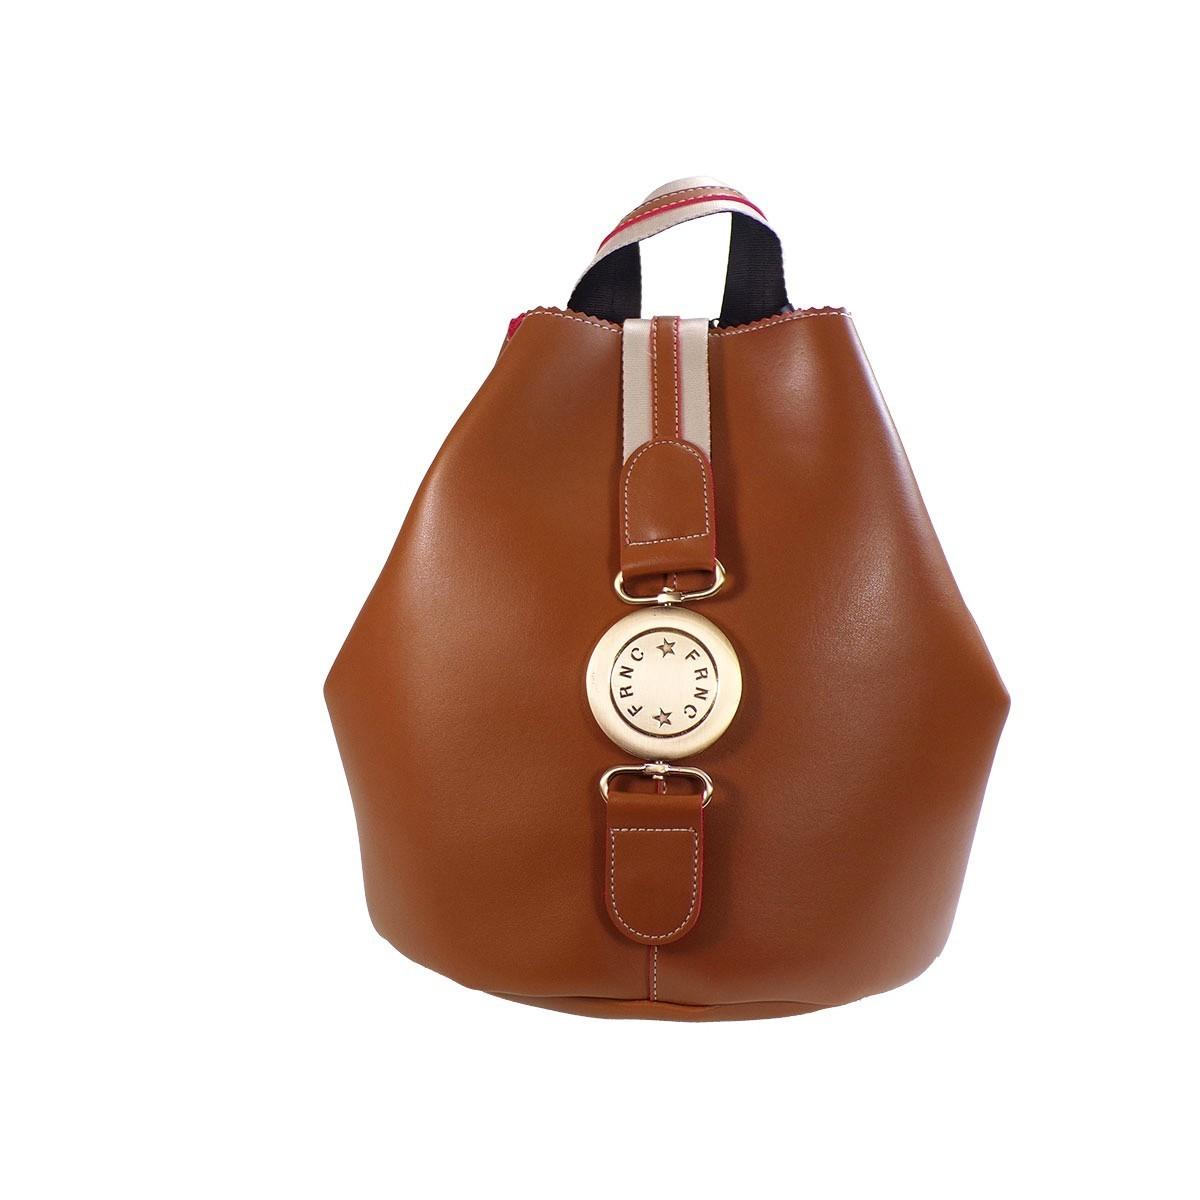 75f18a924c FRNC FRANCESCO Τσάντα Γυναικεία Πλάτης-Backpack 562 Ταμπά Δέρμα ...